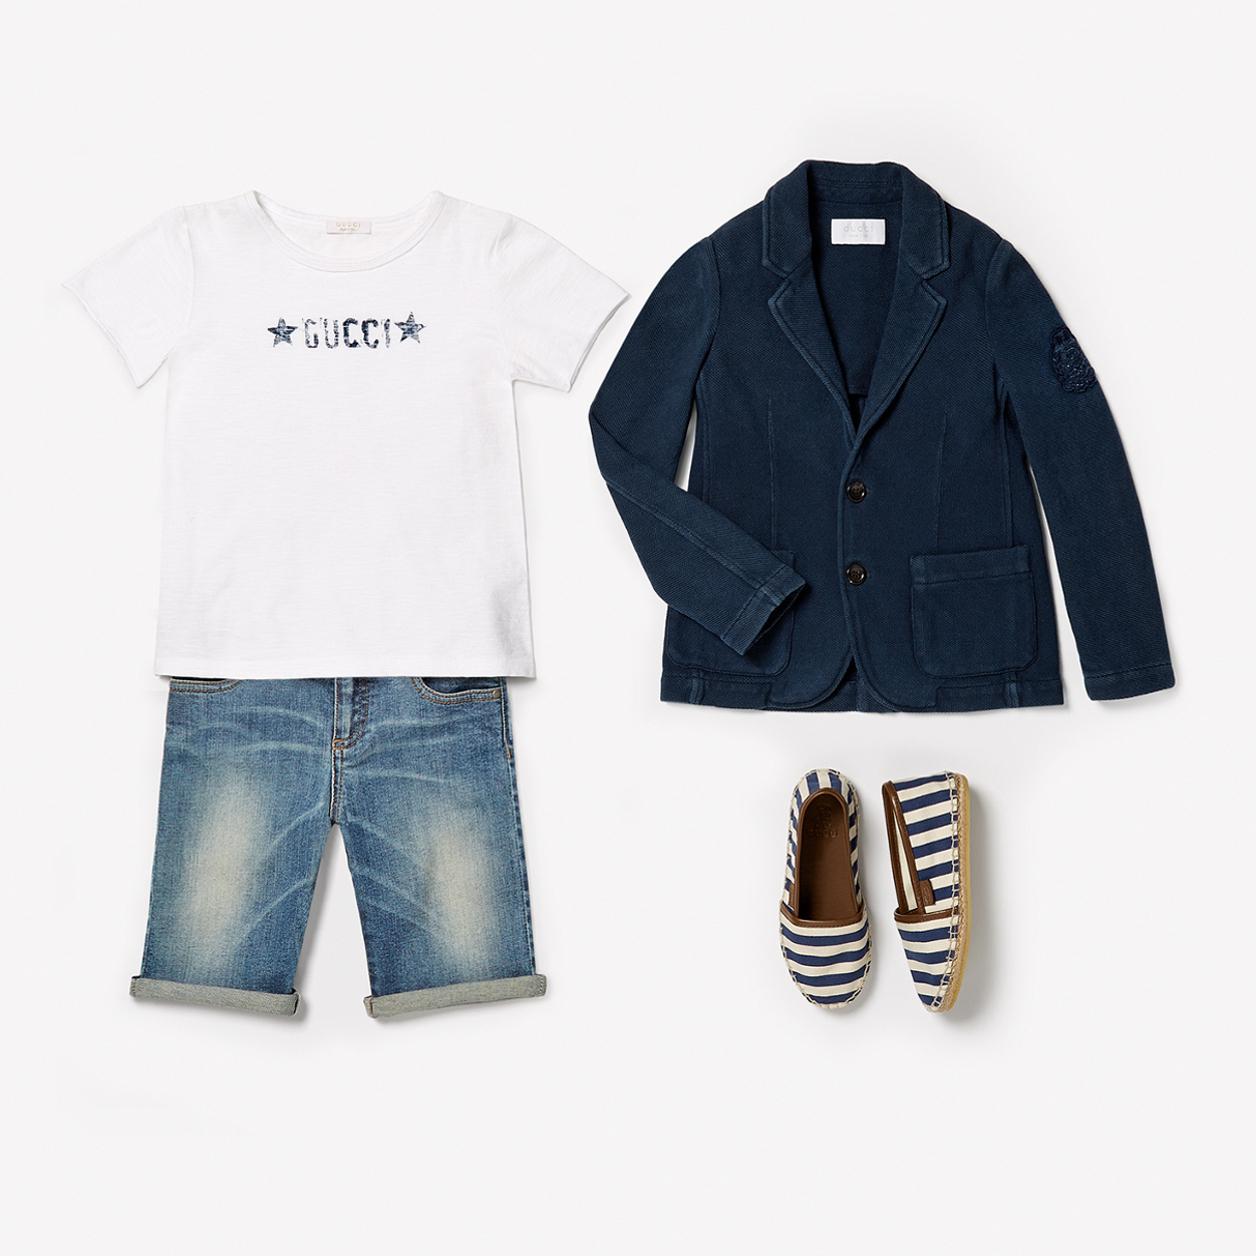 gucci-kids-spring-2015-11 - Fannice Kids Fashion bed354bda5c